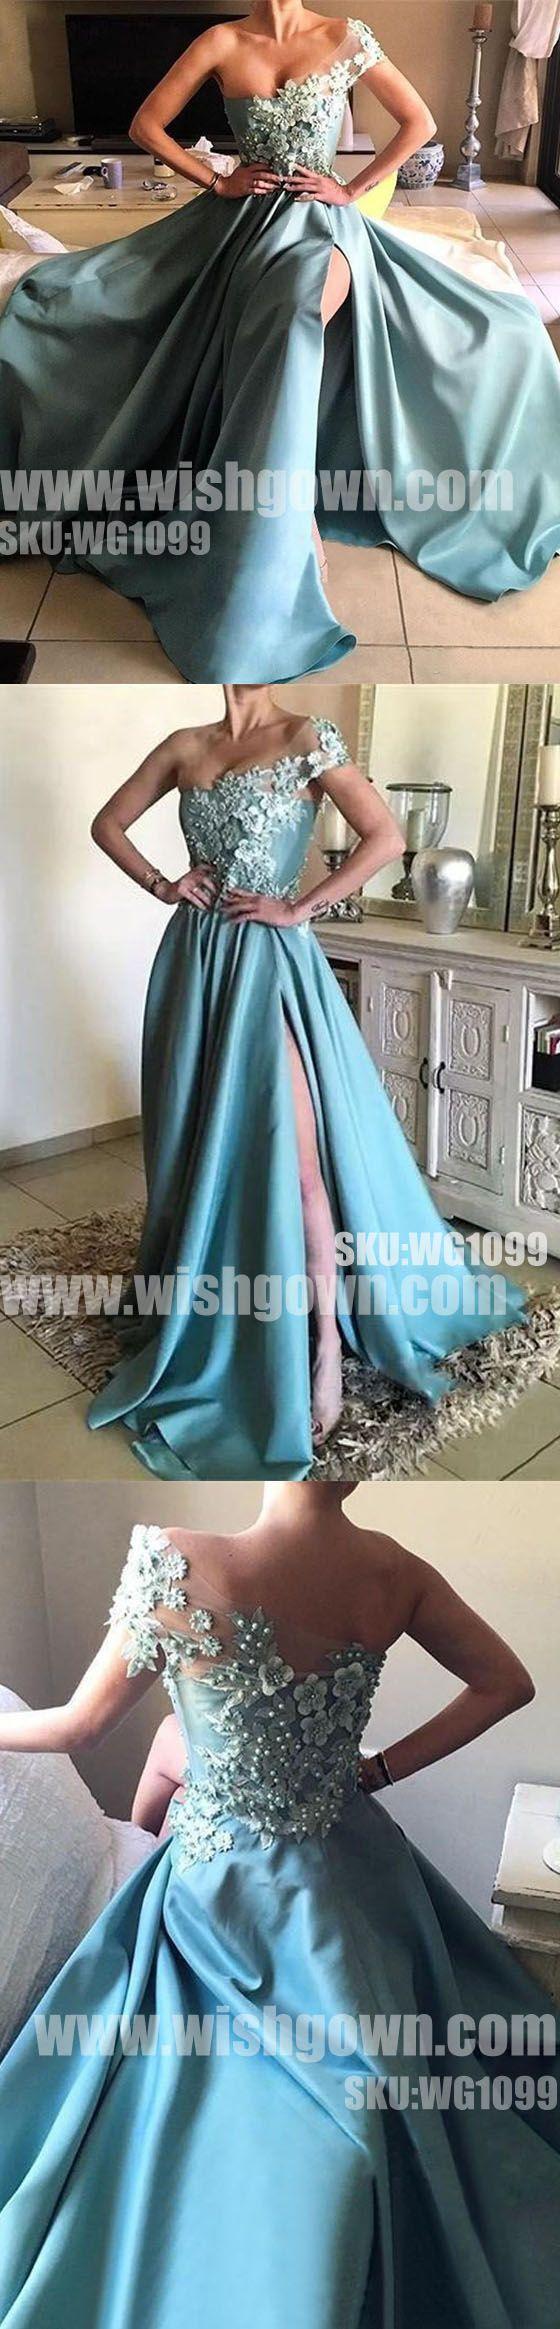 Popular One Shoulder Side Split Elegant Cheap Long Prom Dresses, WG1099 #promdress #promdresses #longpromdress #longpromdresses #eveningdress